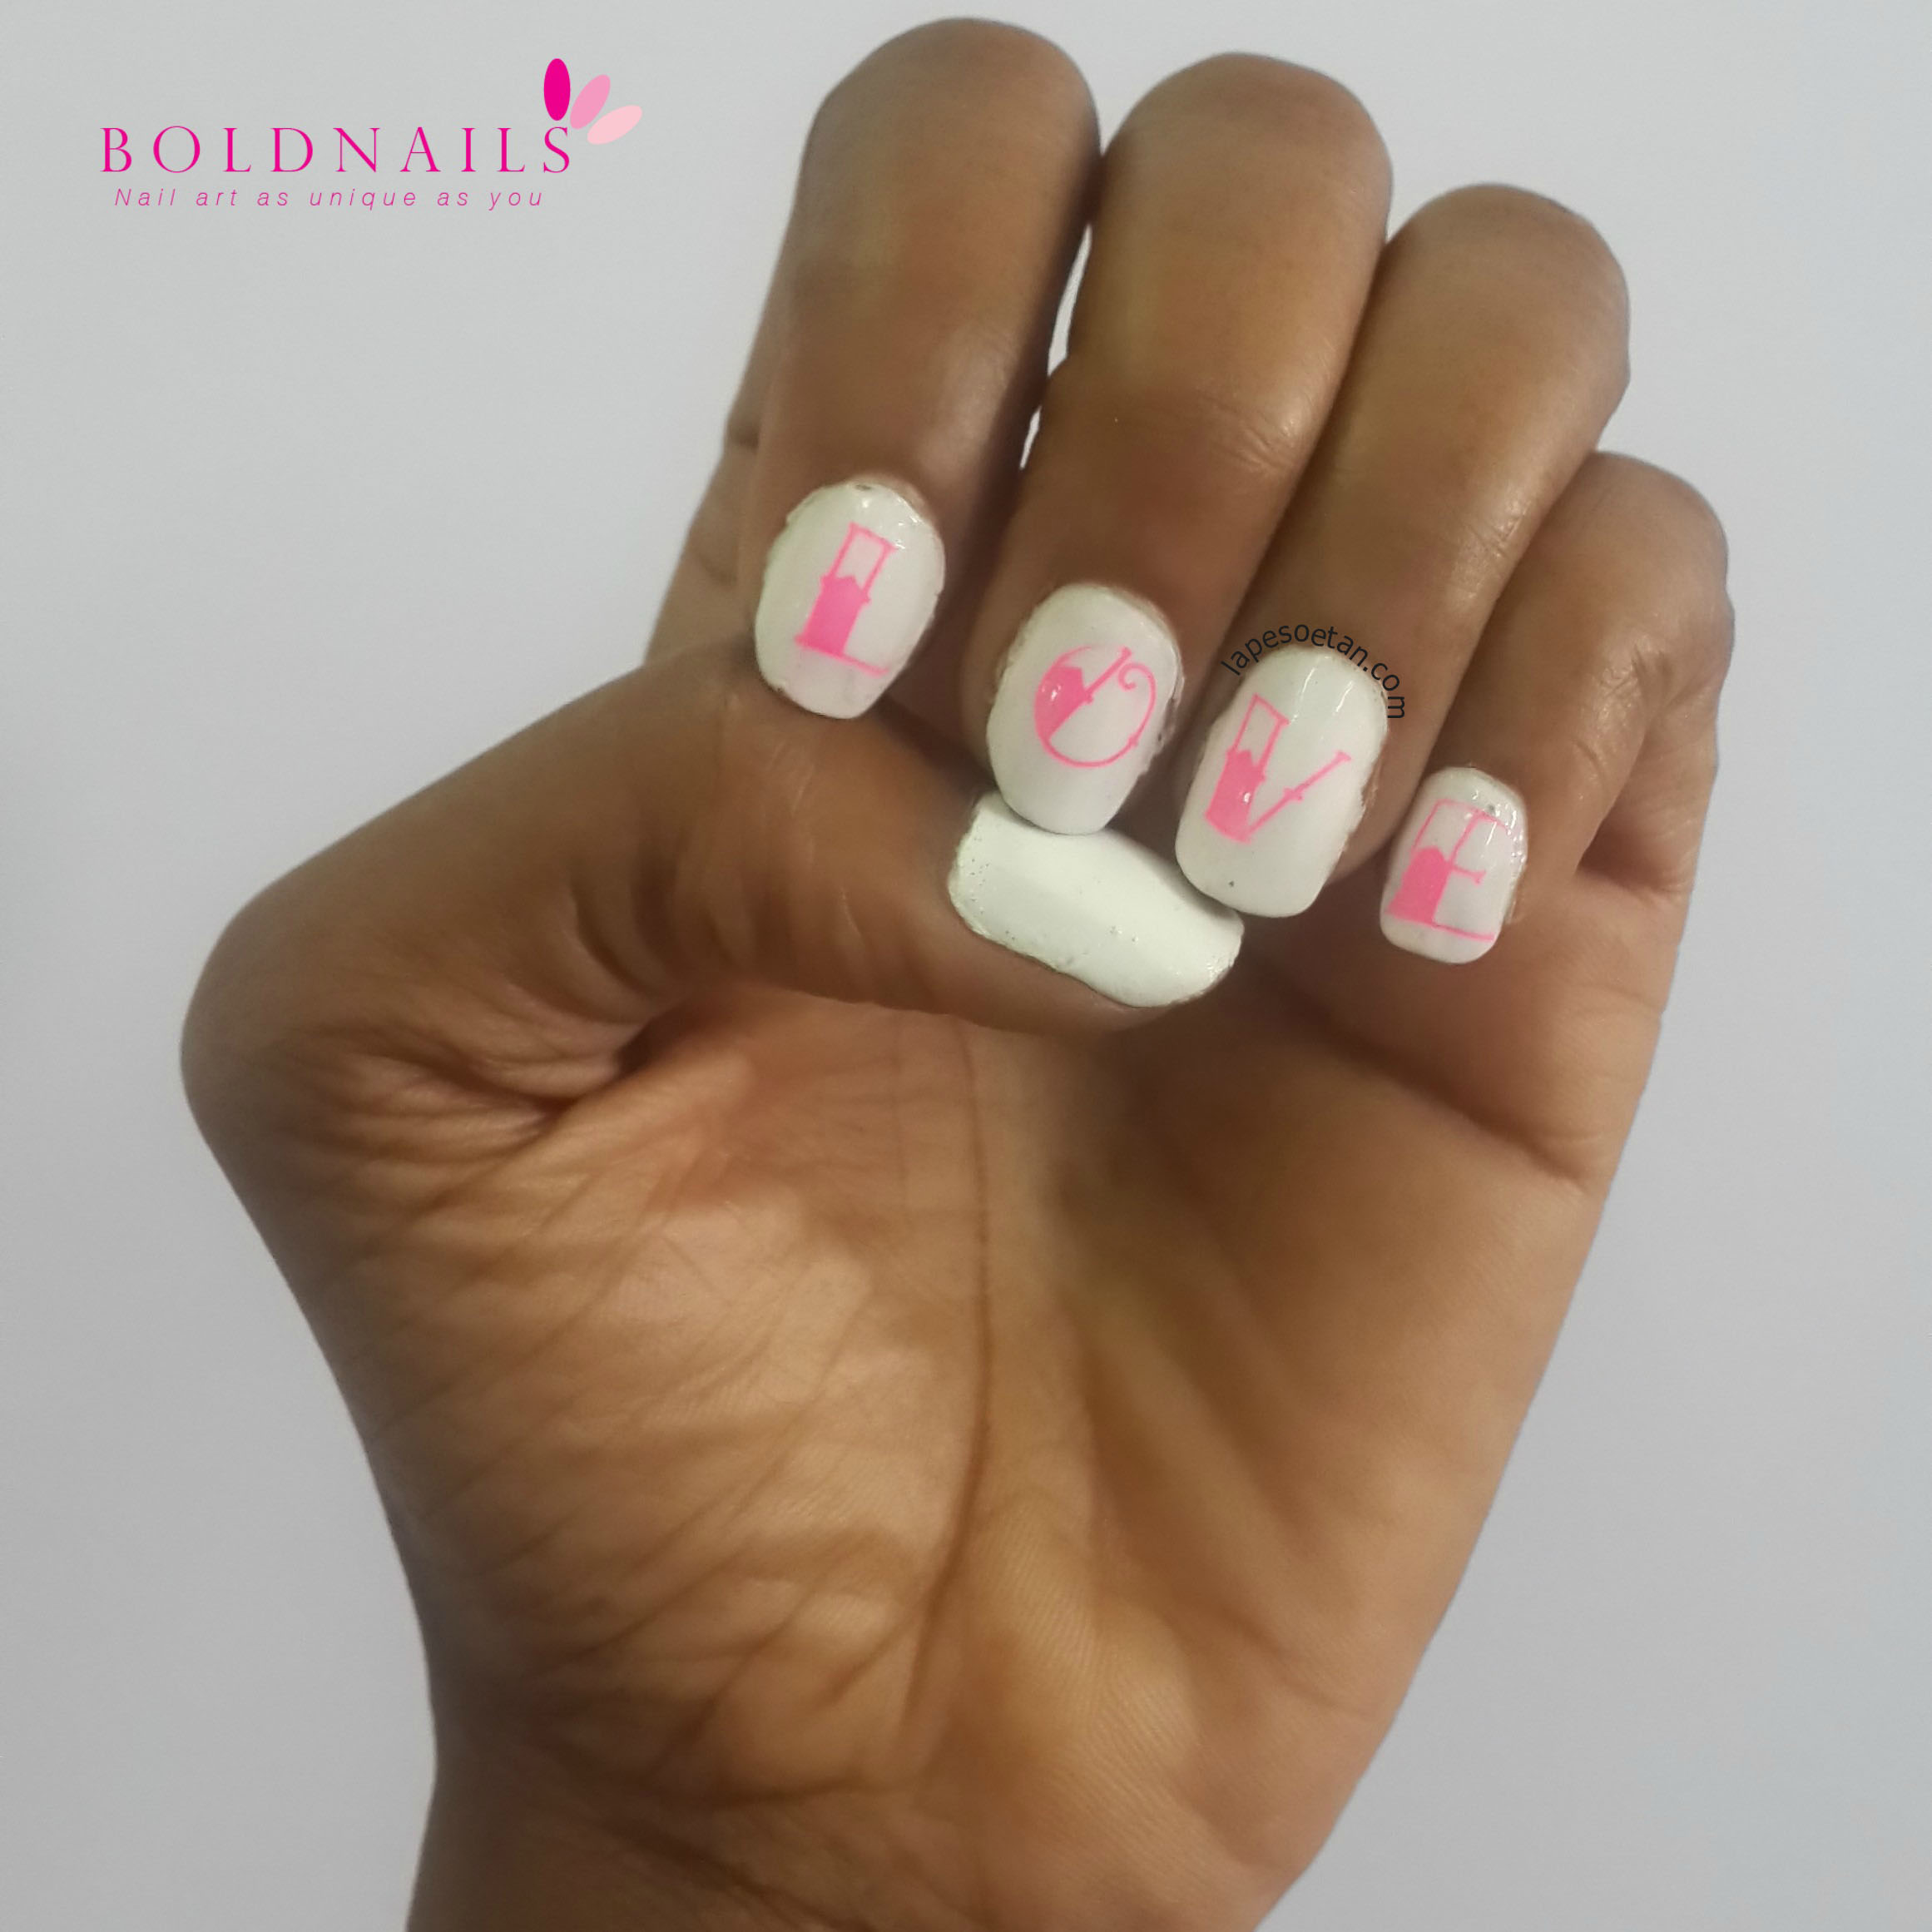 Nail Art: Love Nails - Lape Soetan